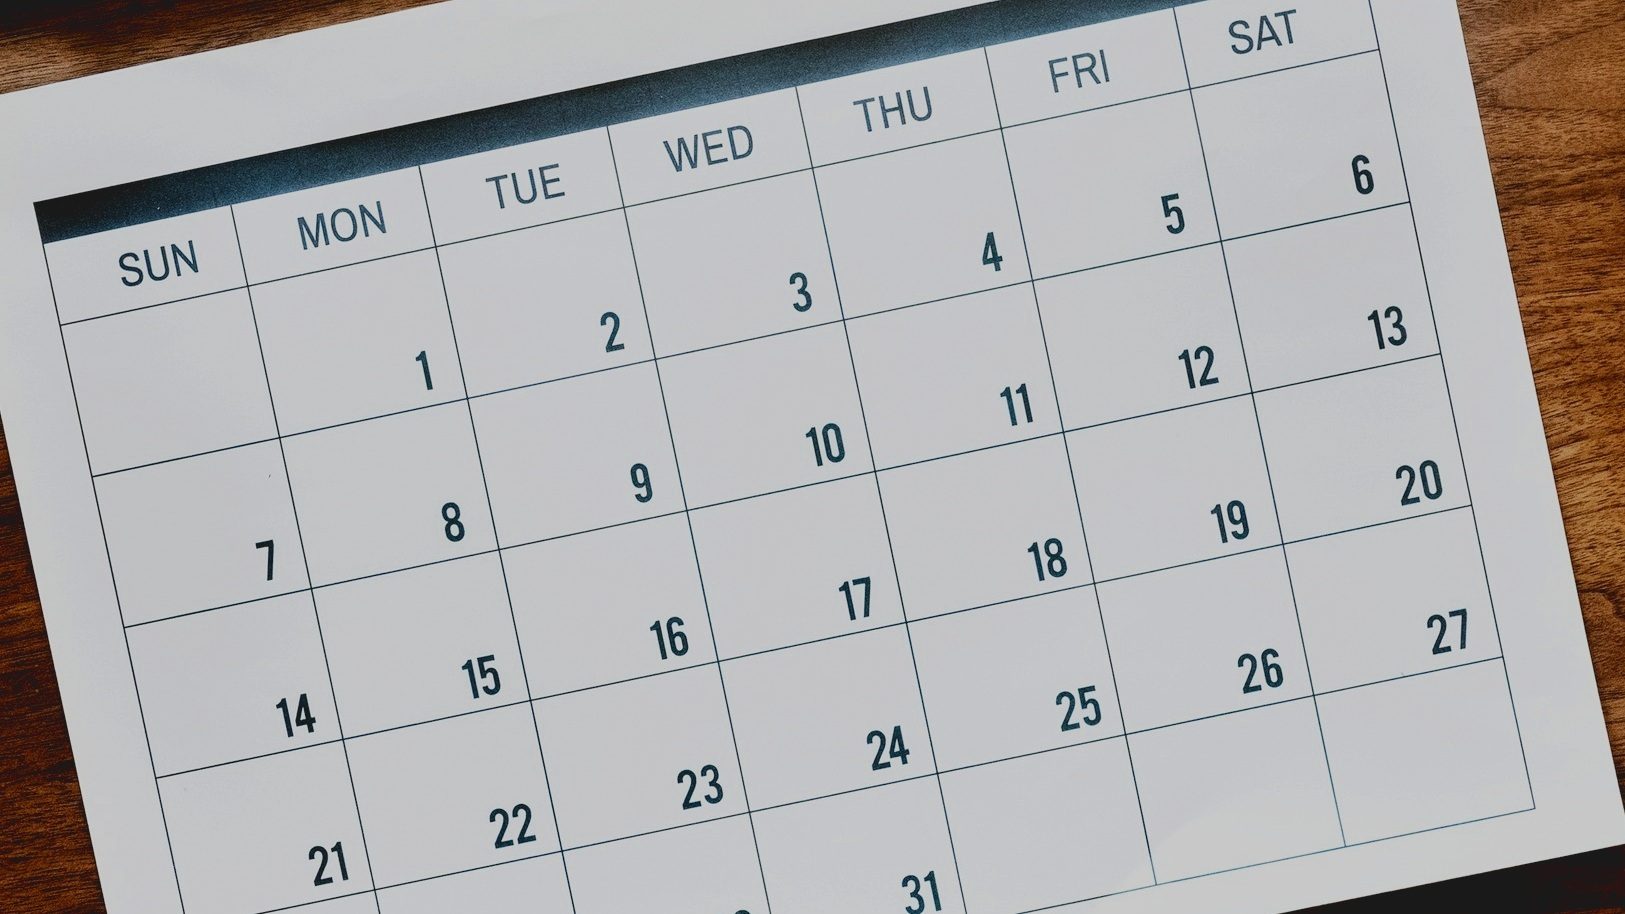 High School WeeklySchedule -